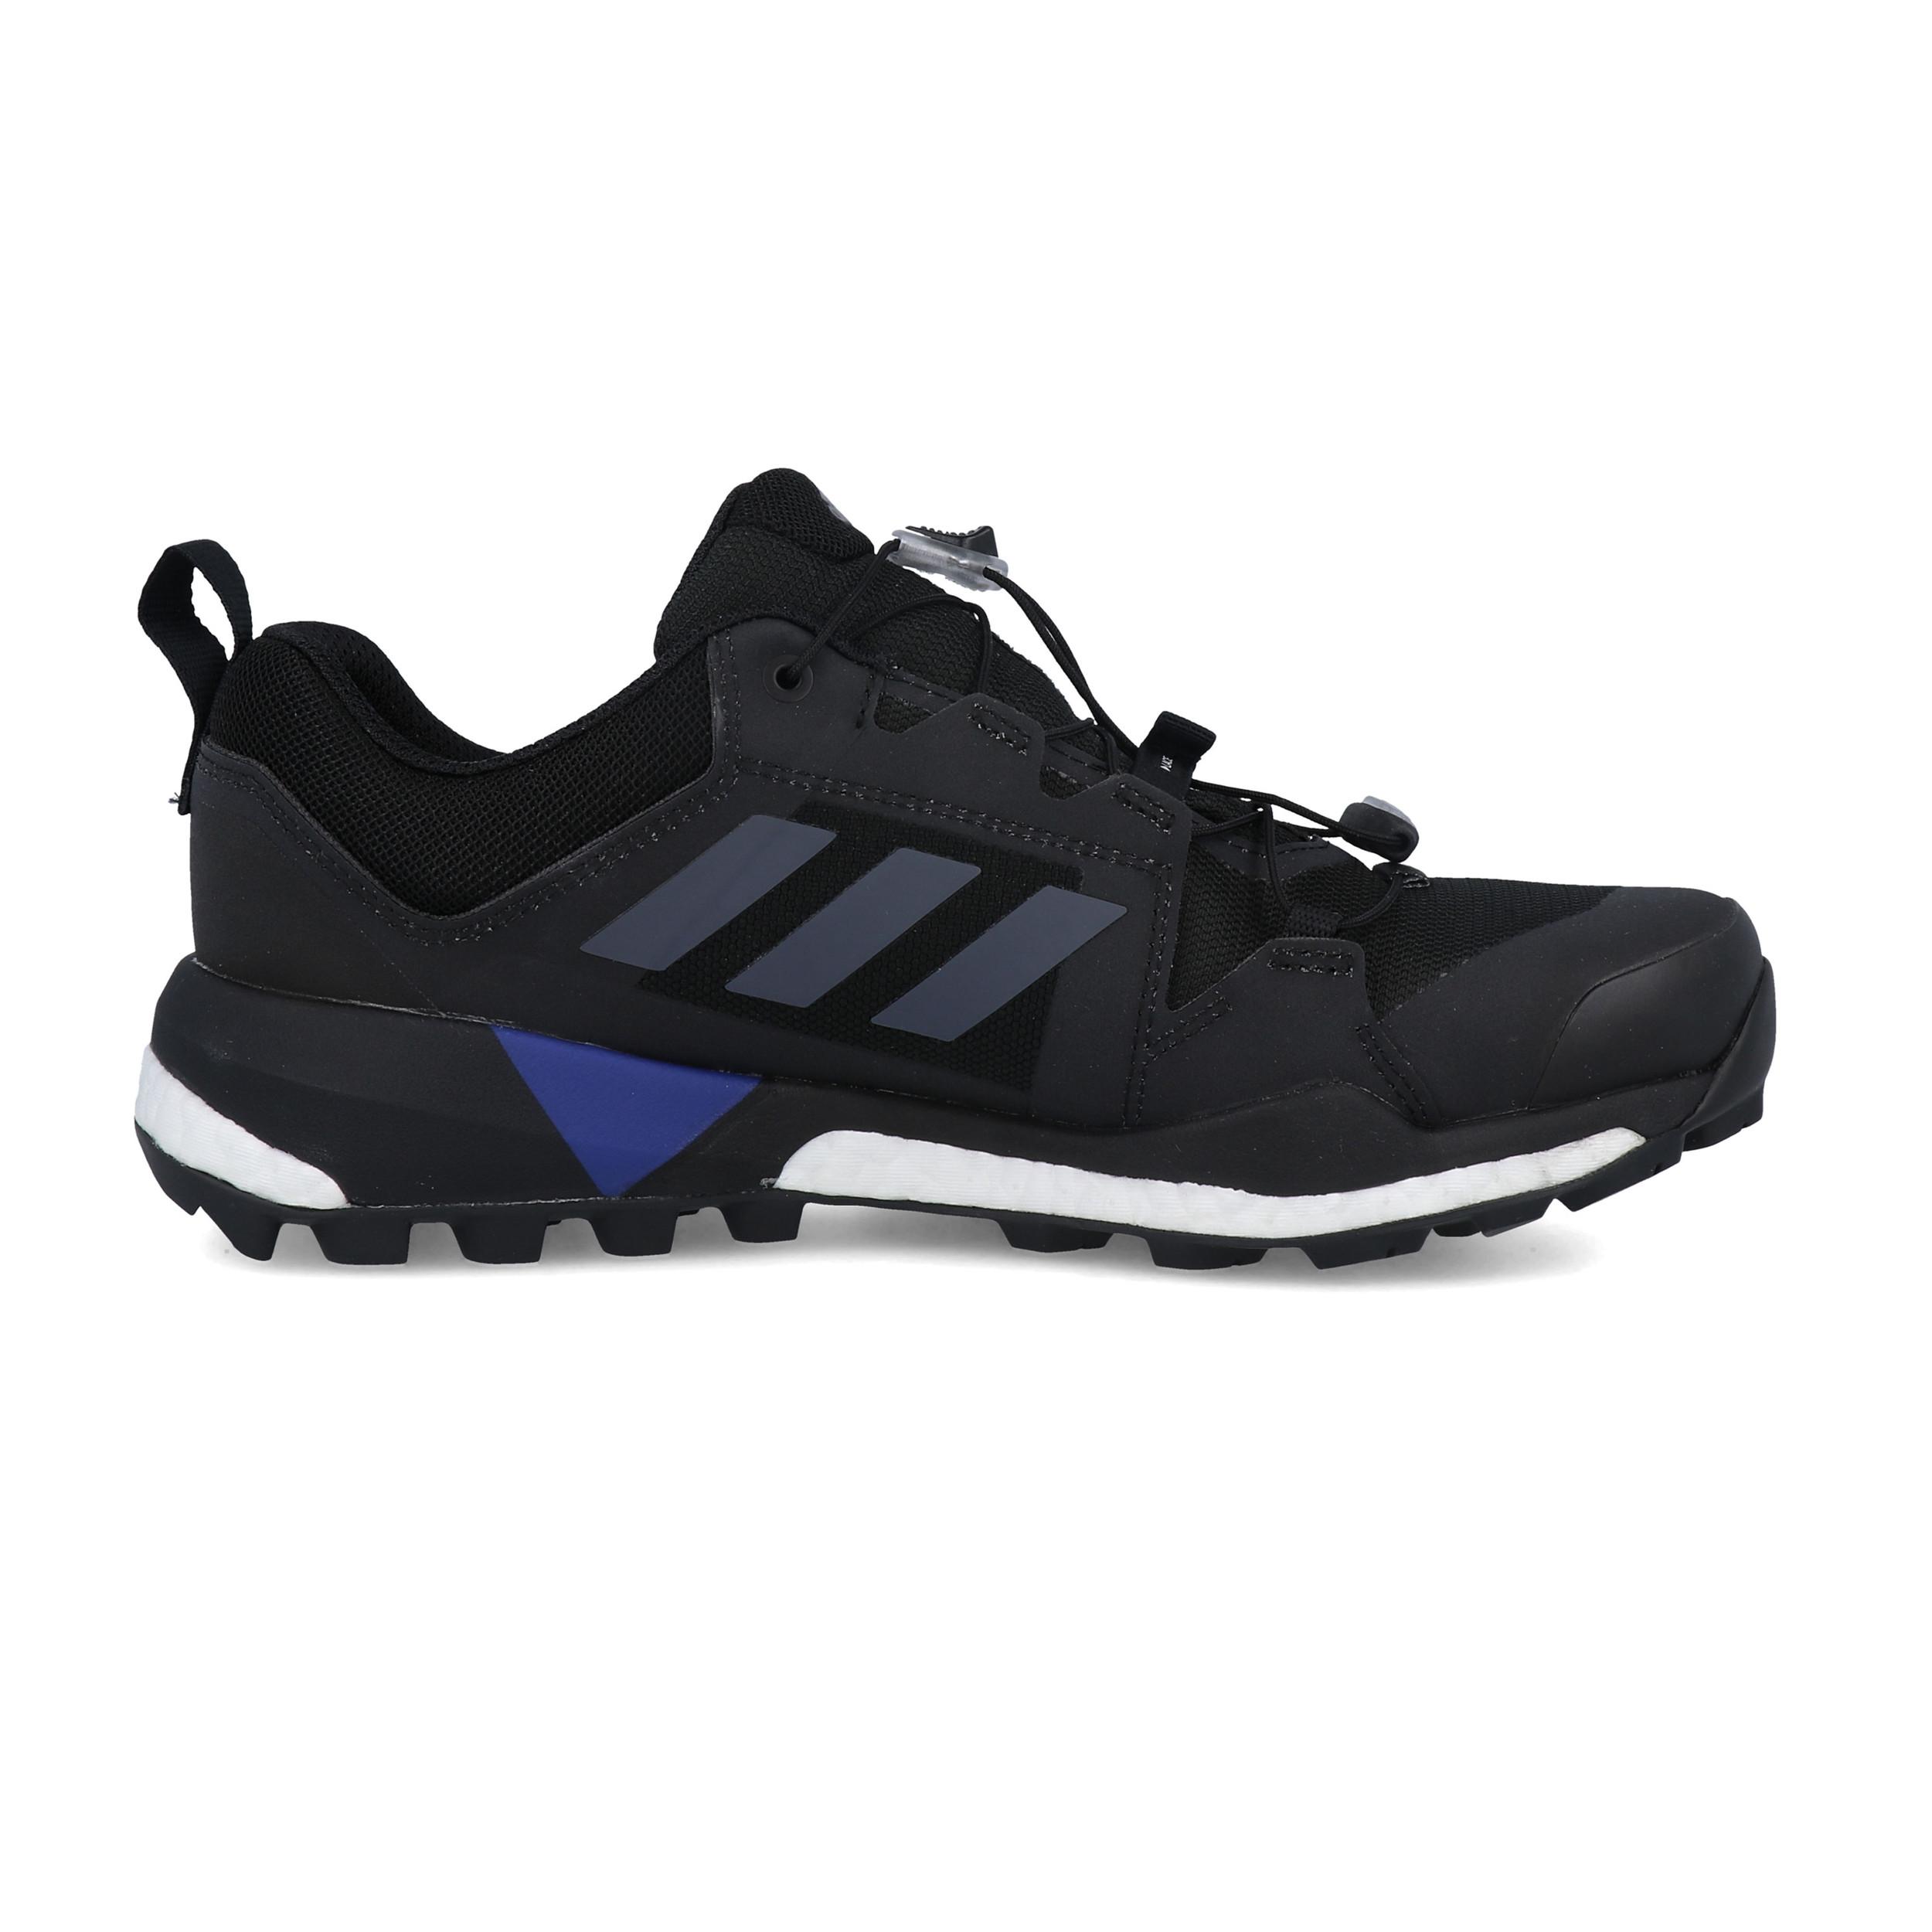 ADIDAS-Da-Uomo-Terrex-skychaser-XT-GORE-TEX-TRAIL-RUNNING-scarpe-da-ginnastica miniatura 37